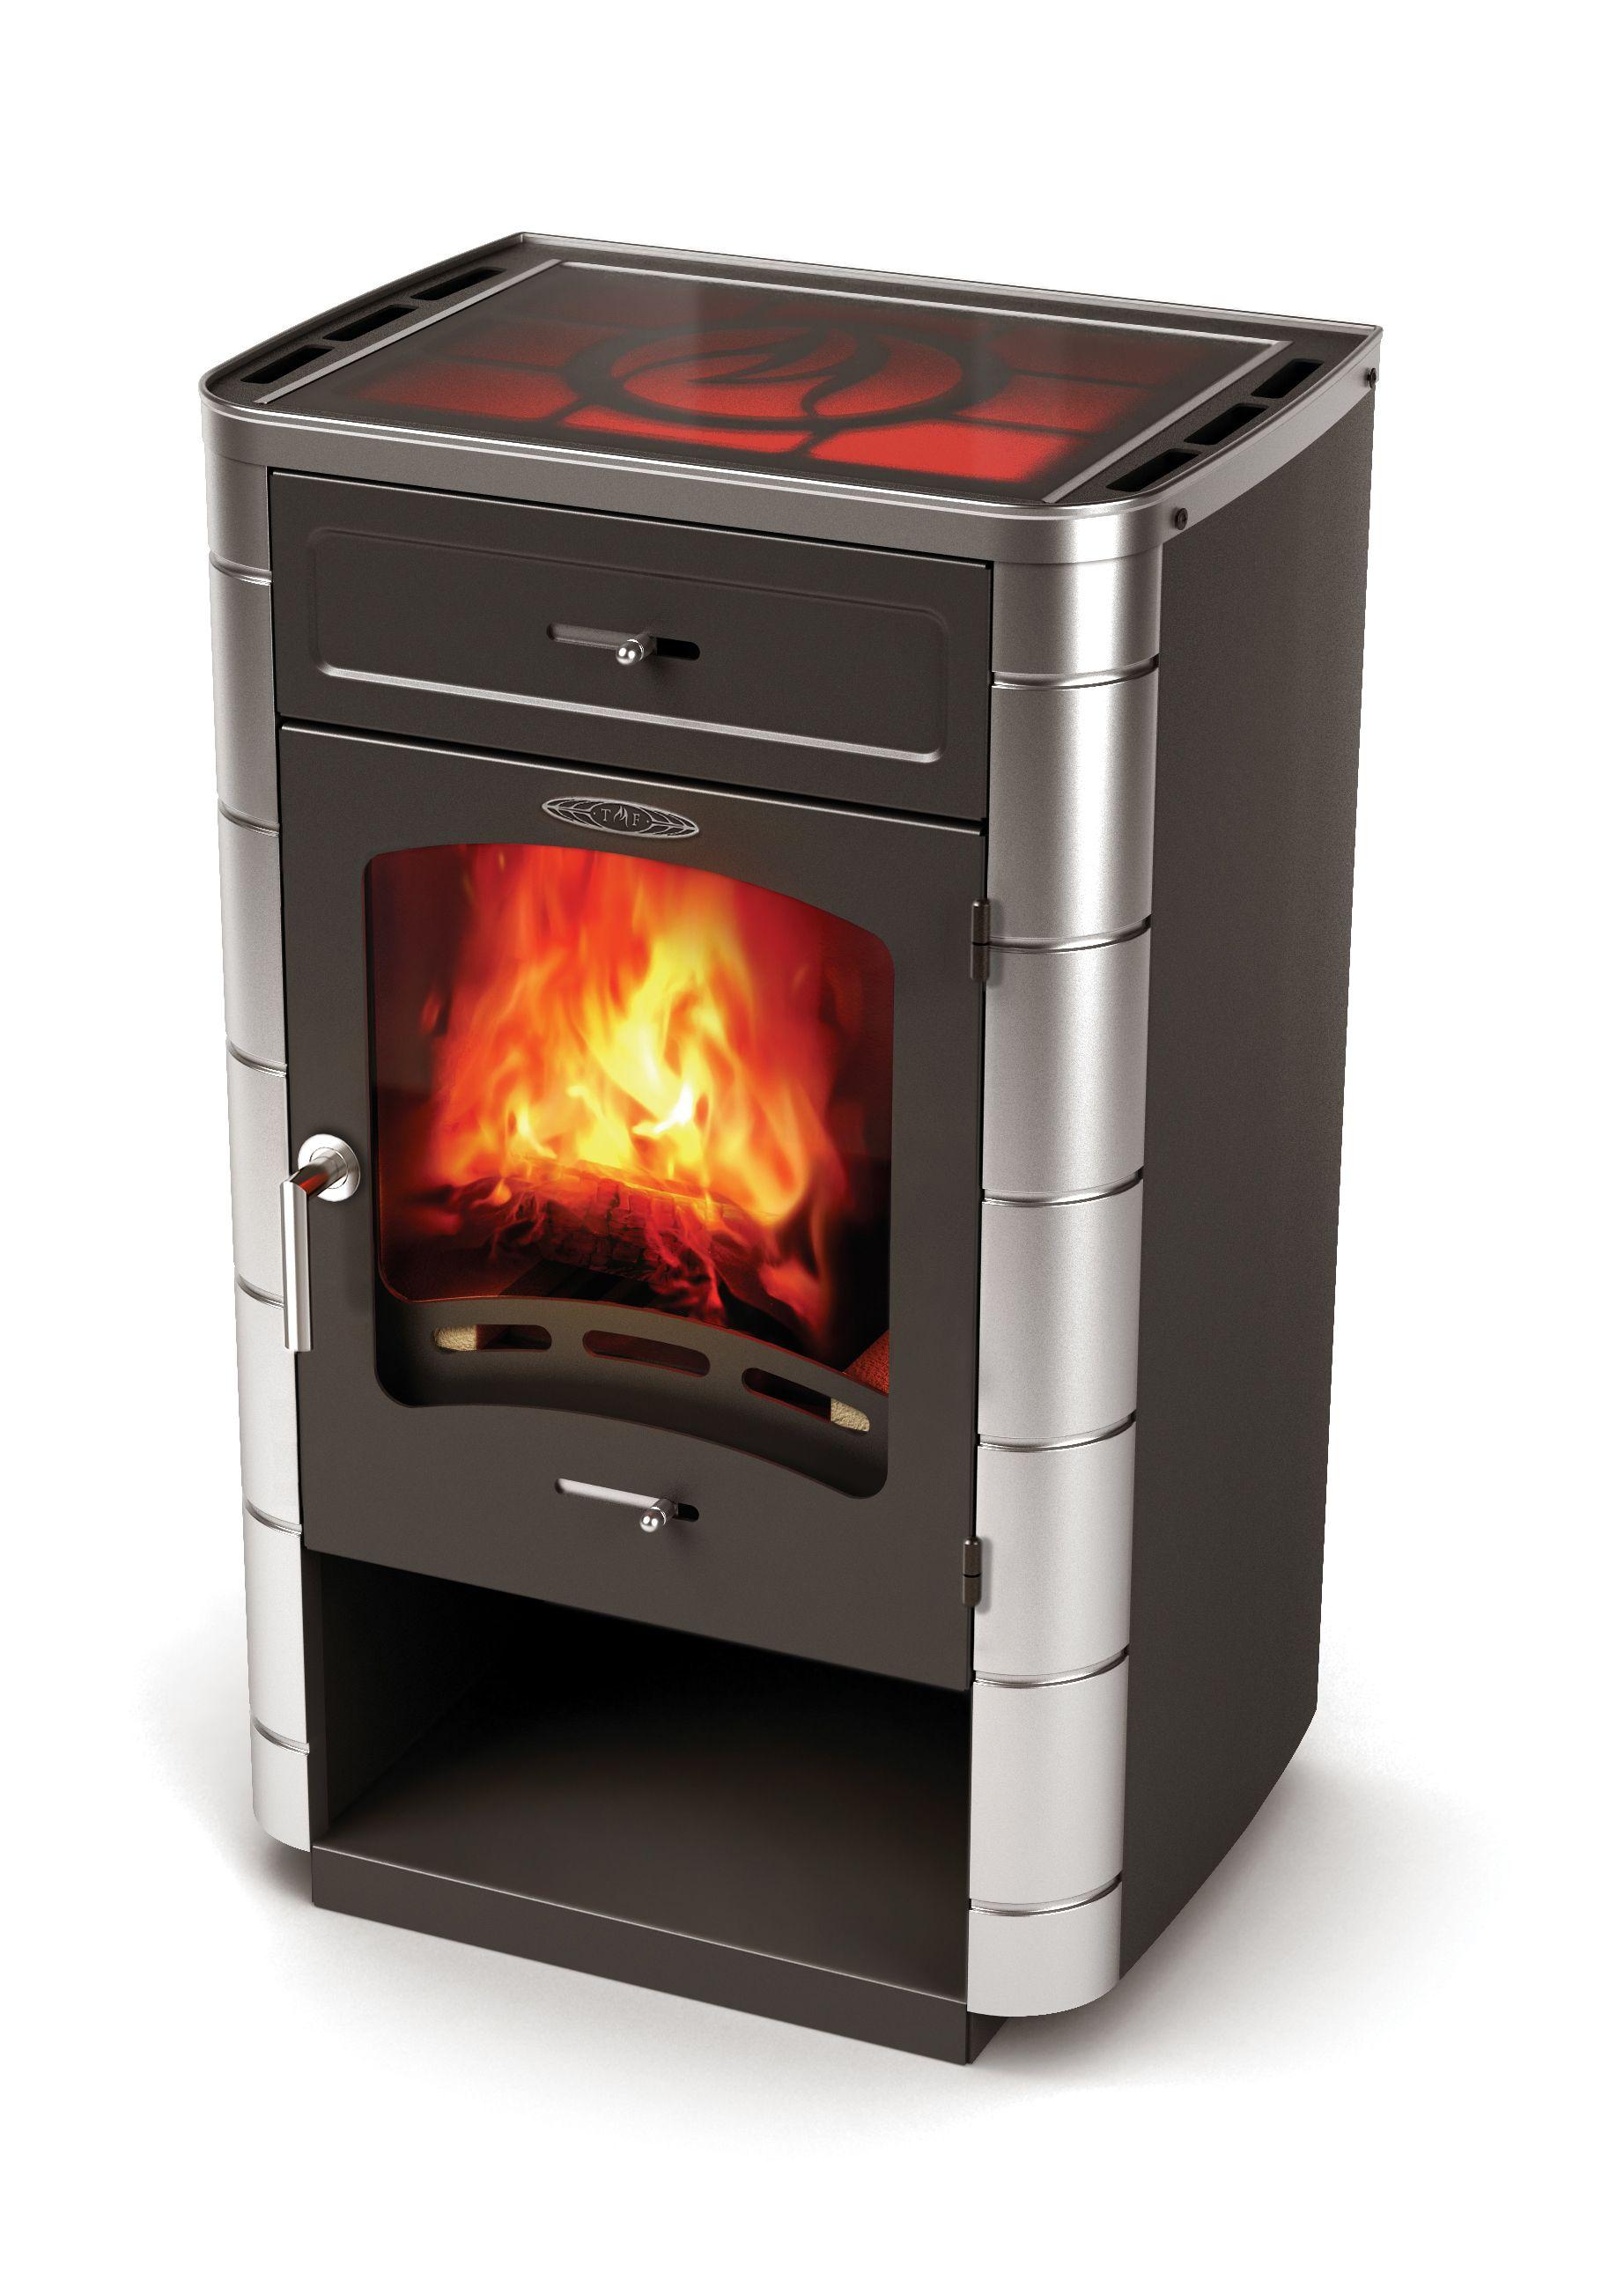 Yauza Heating and cooking stove fireplace stove